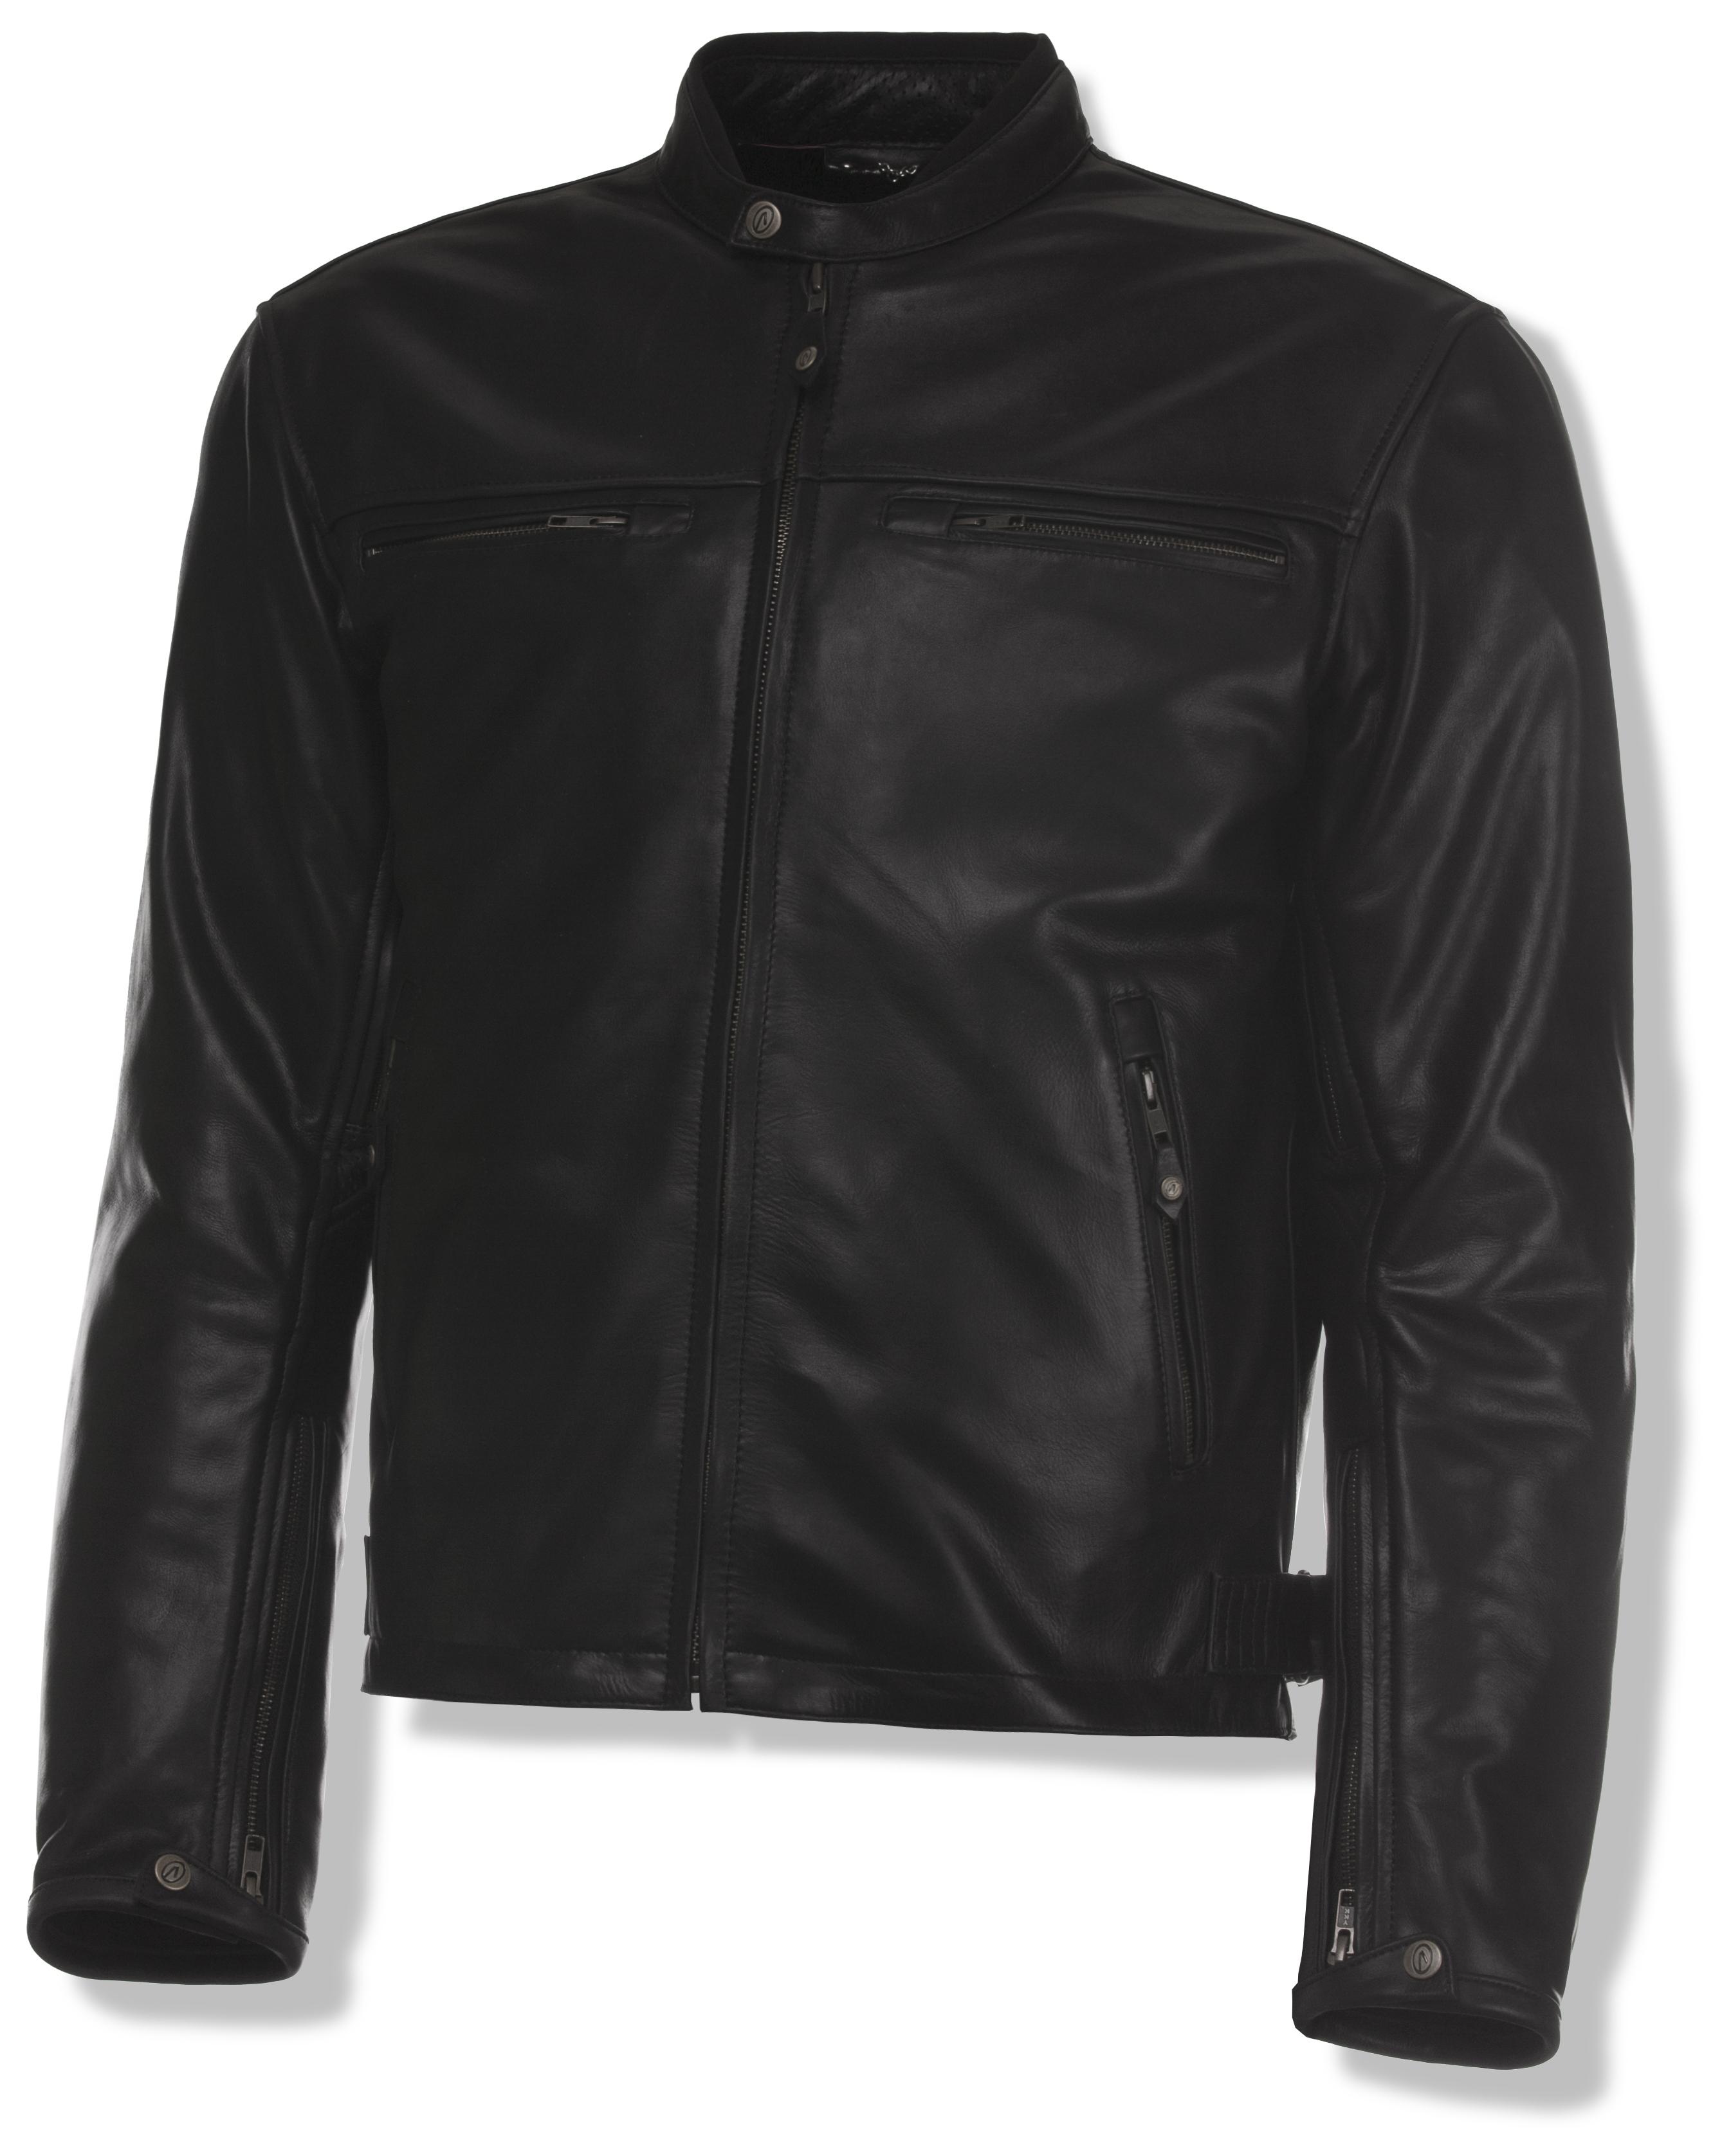 Leather jacket sale - Leather Jacket Sale 26